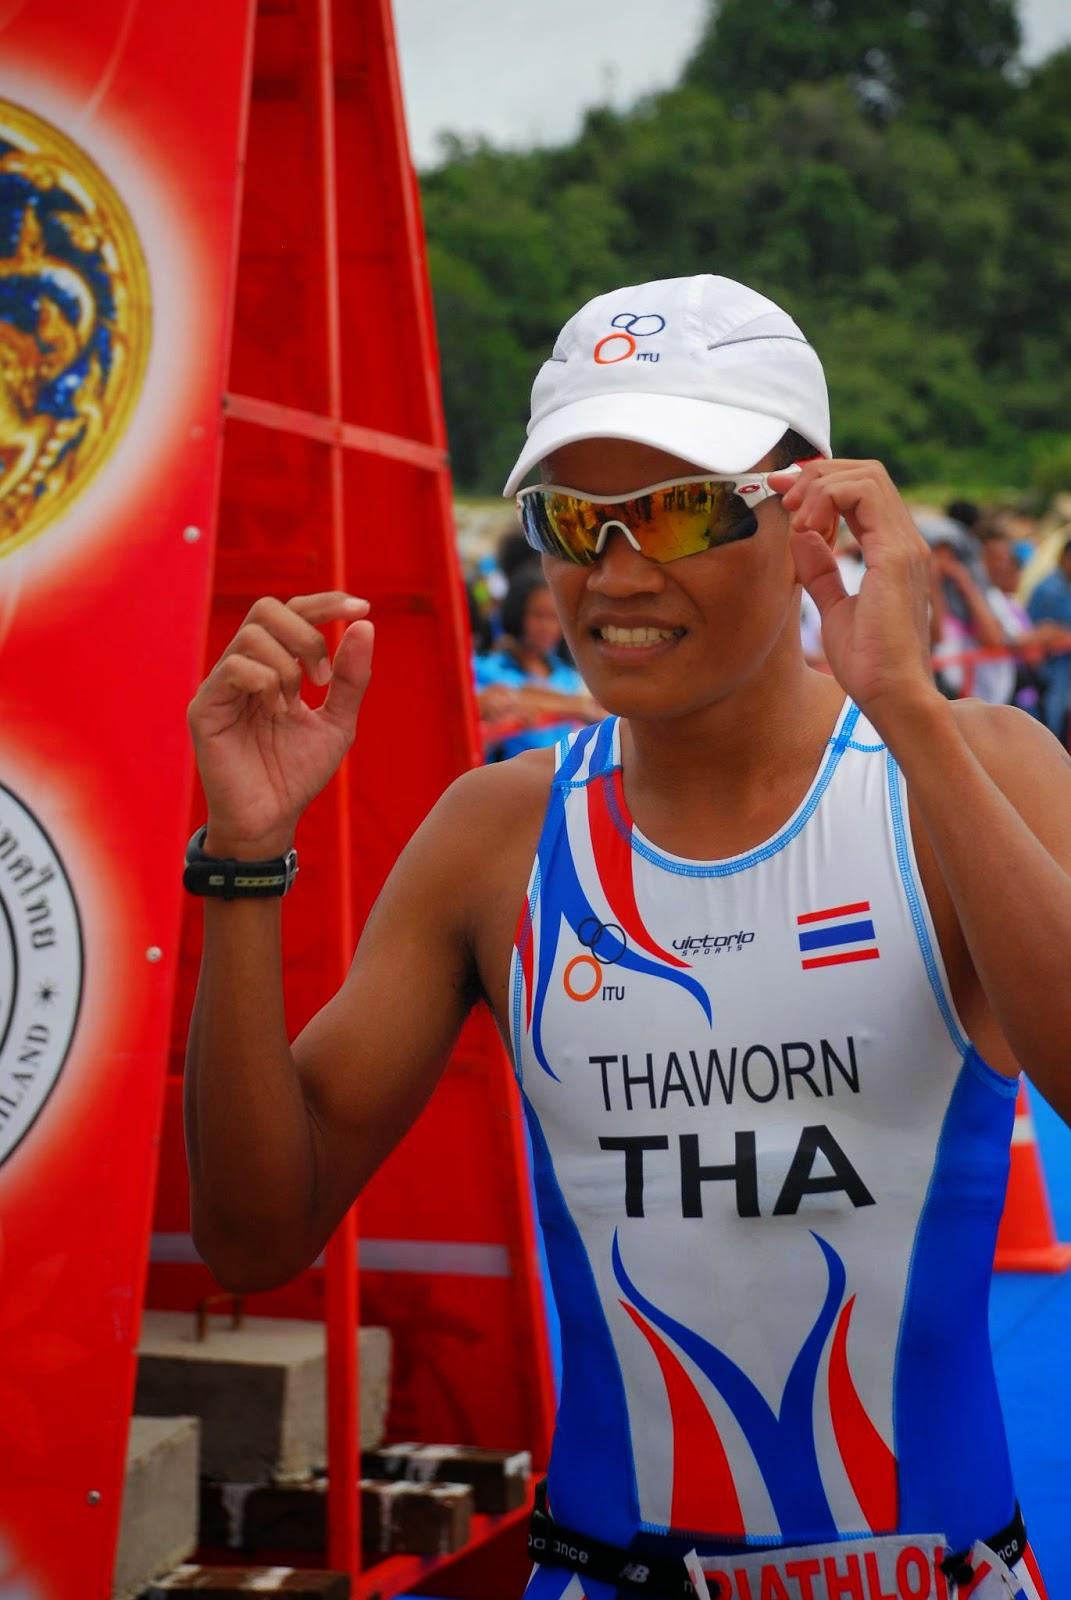 Male Athletes World: Triathlon: USAs triathlon team